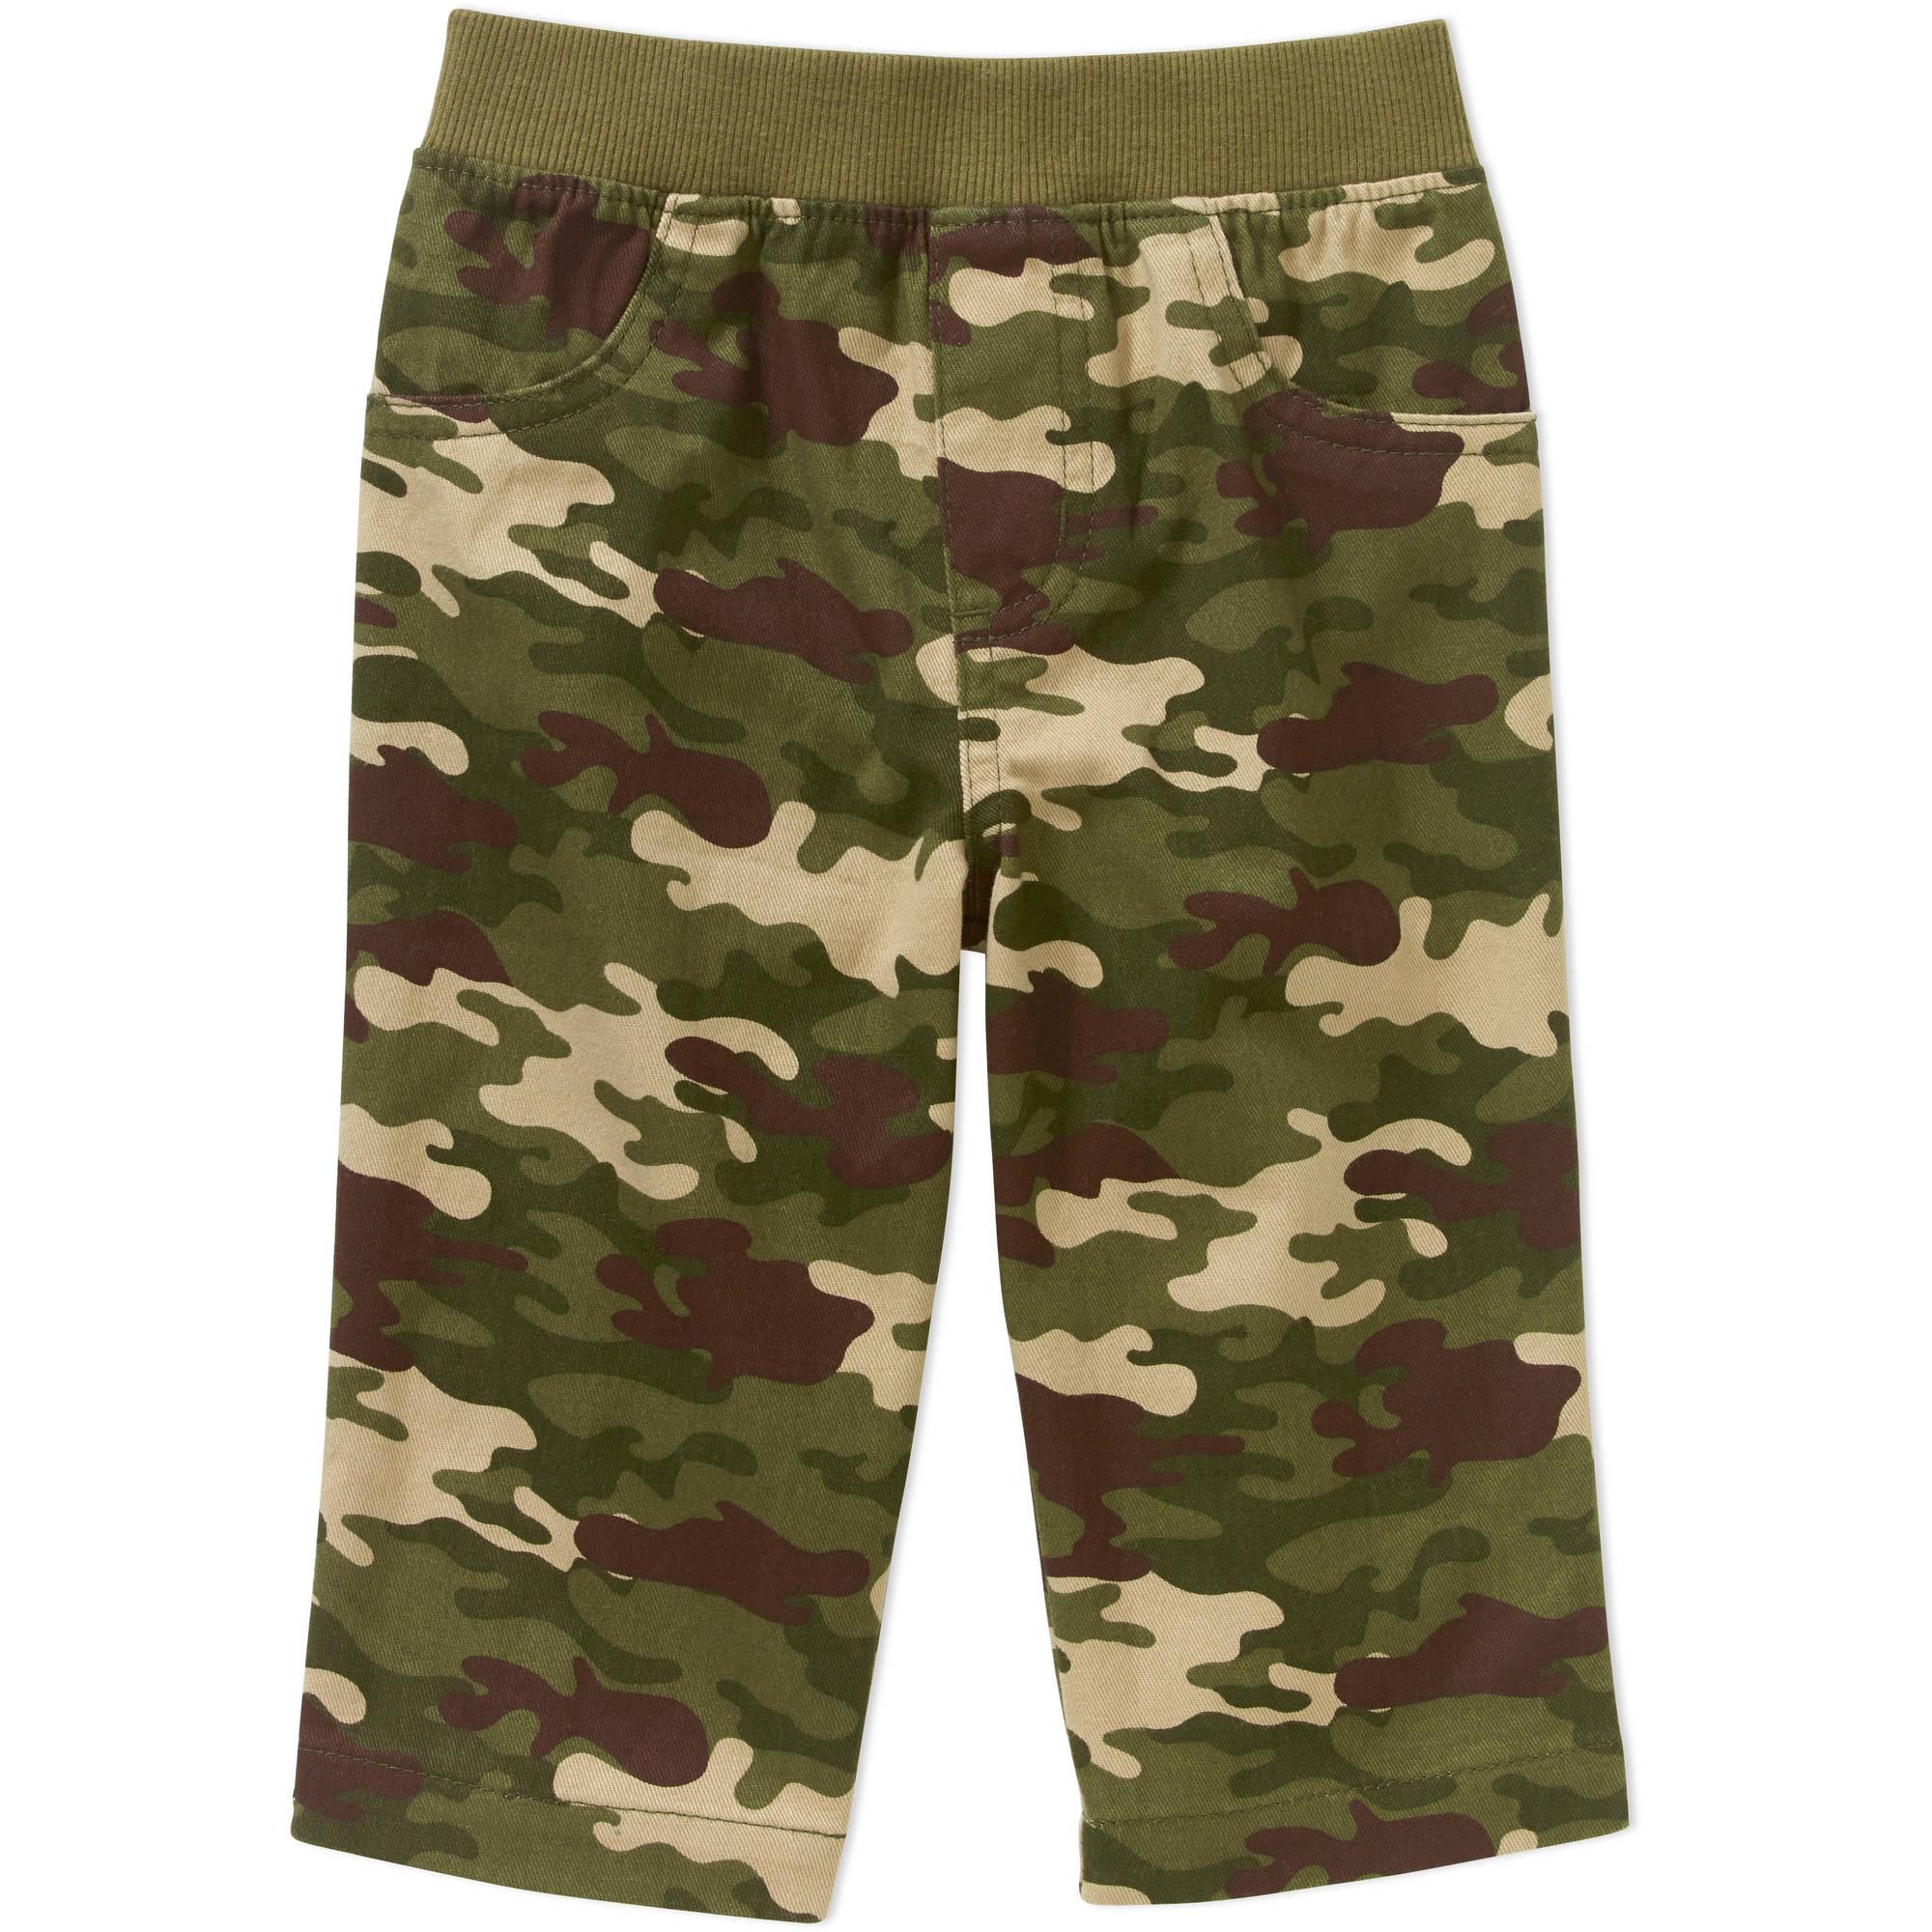 Garanimals Baby Boy Print Camo Woven Pants